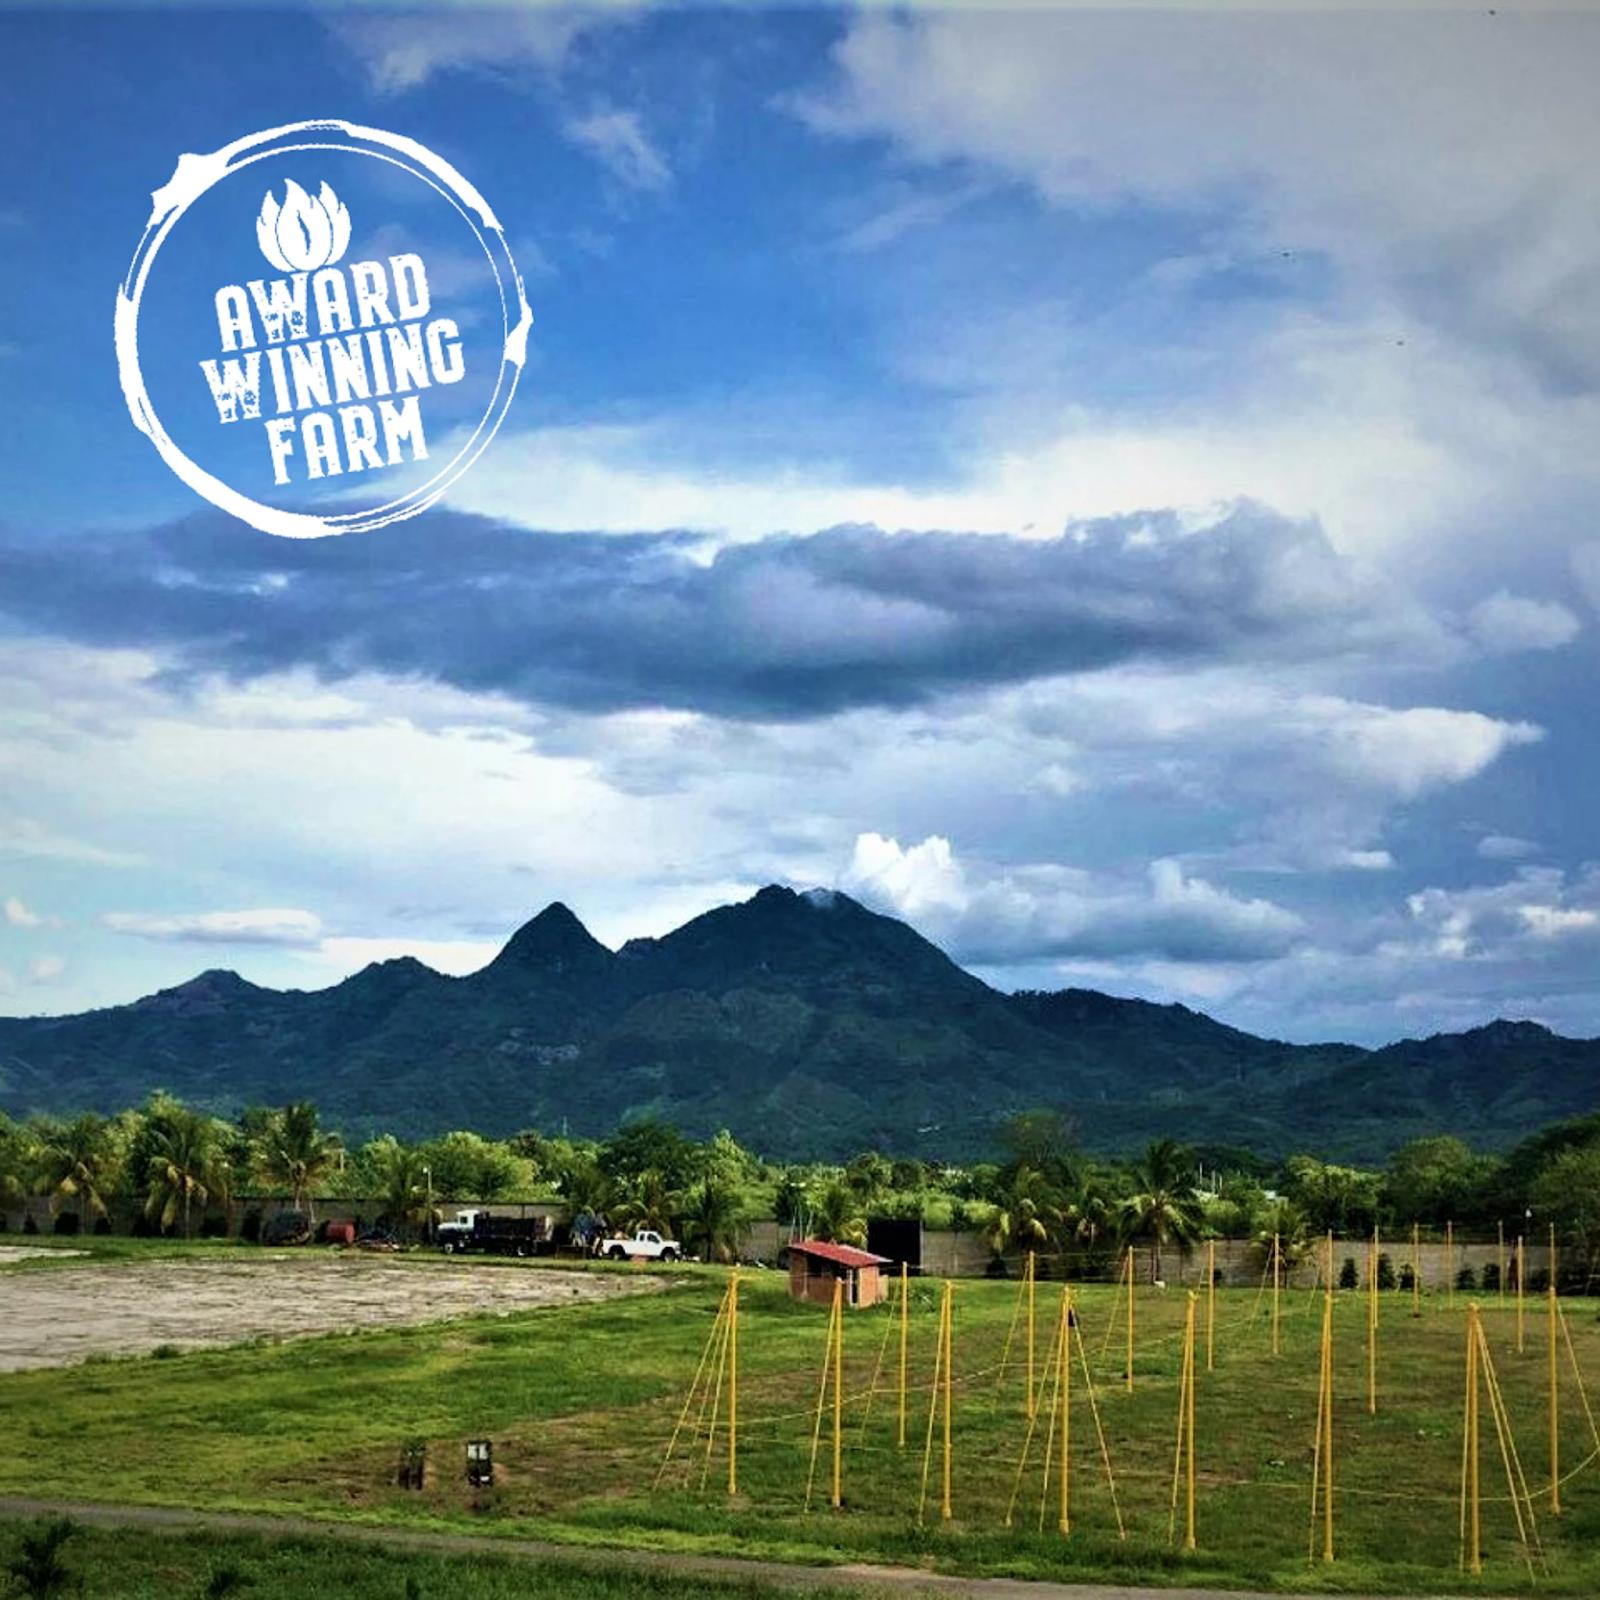 An award-winning farm in Nicaragua